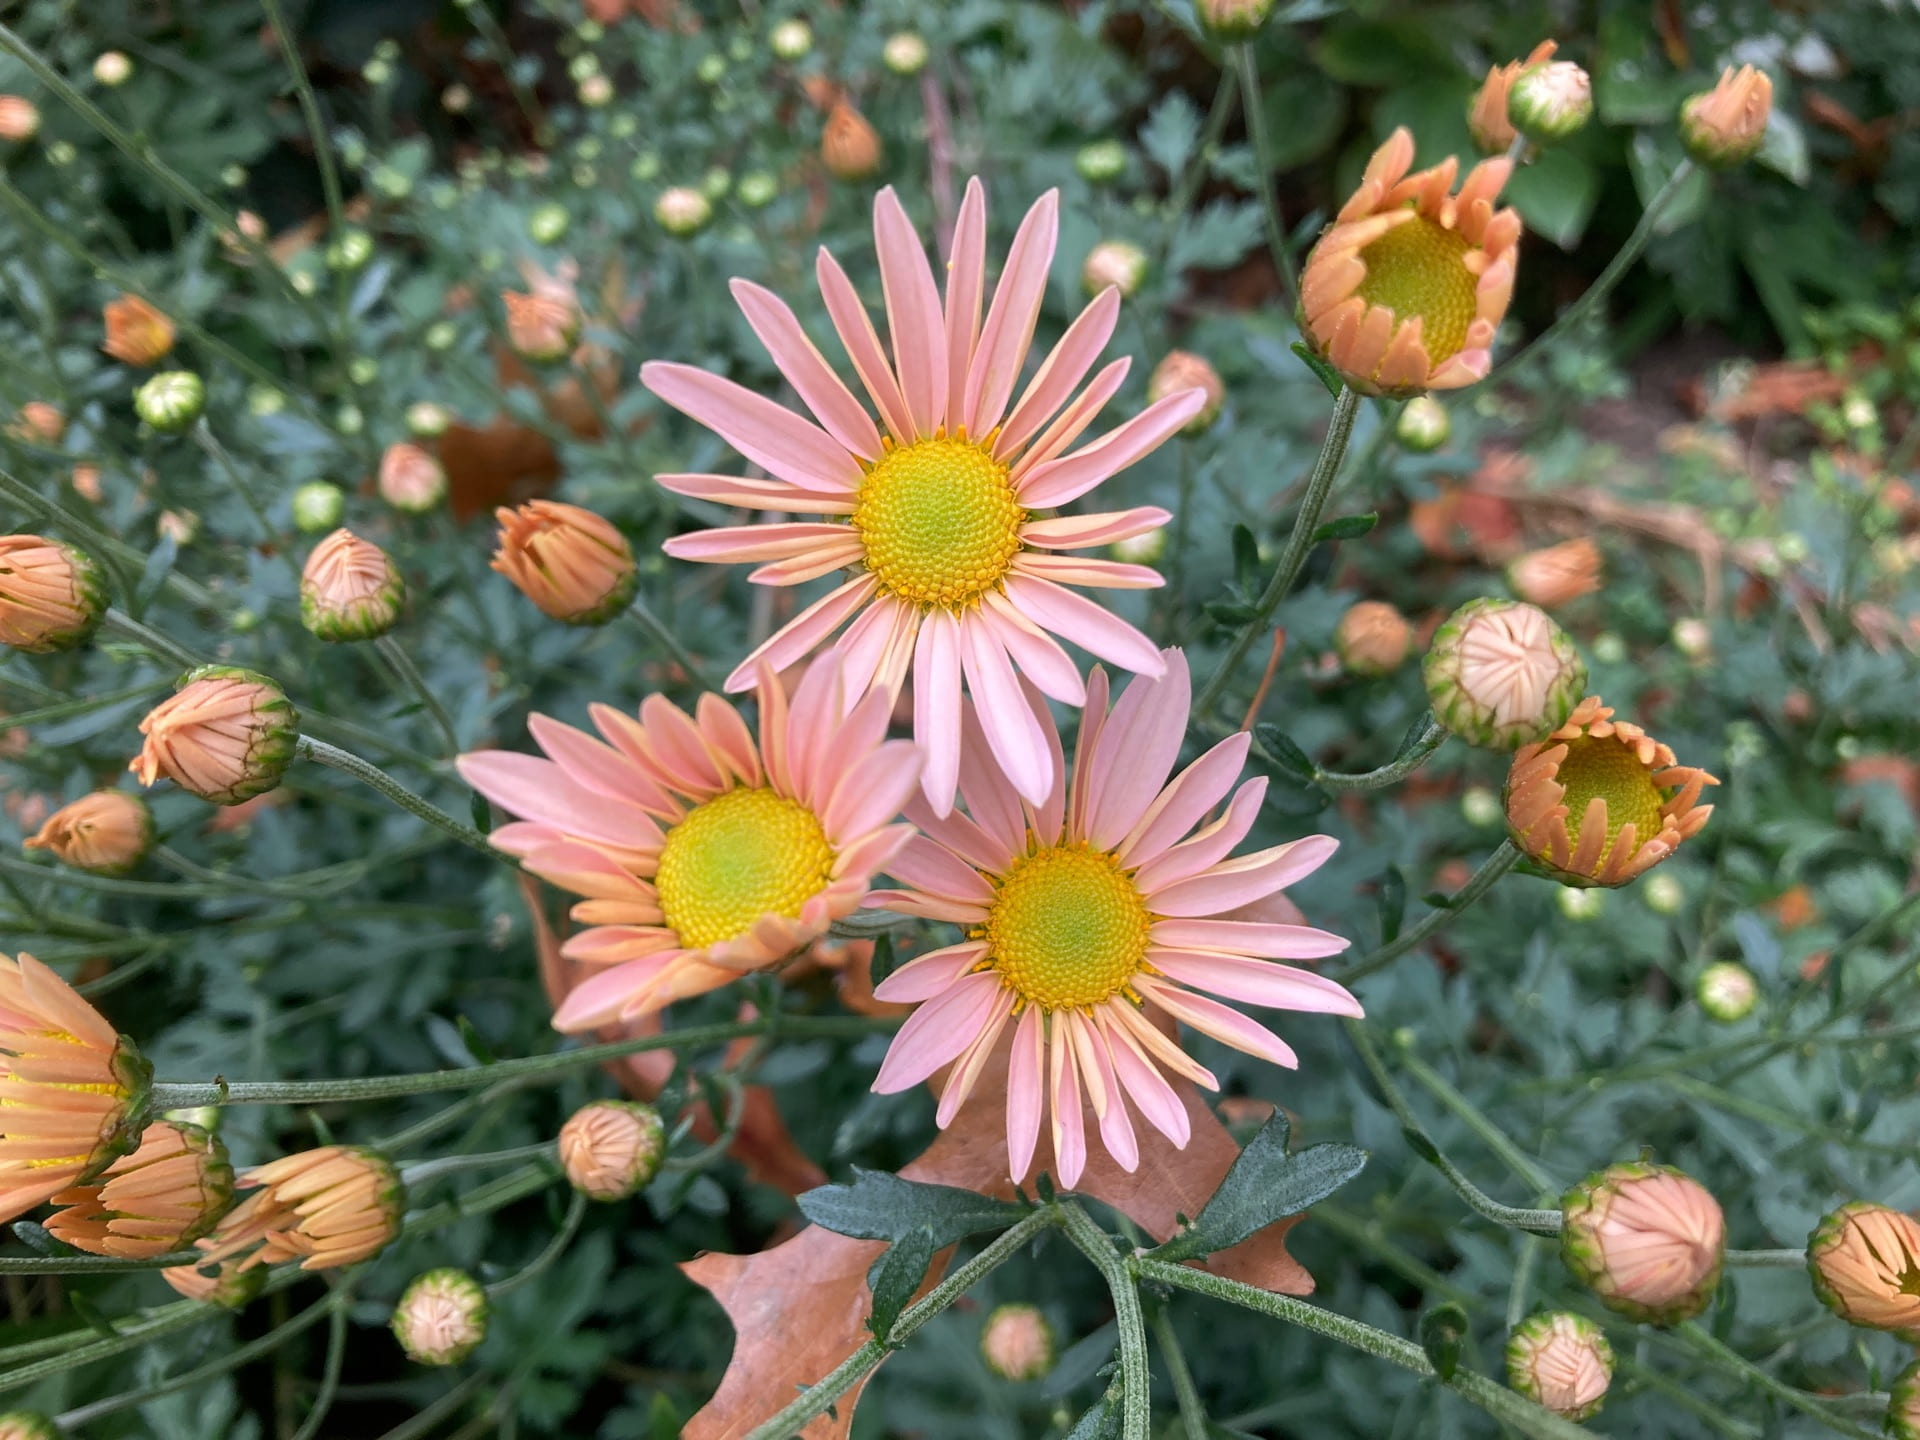 Chrysanthemum 'Hillside Sheffield Pink' flower buds just beginning to open.